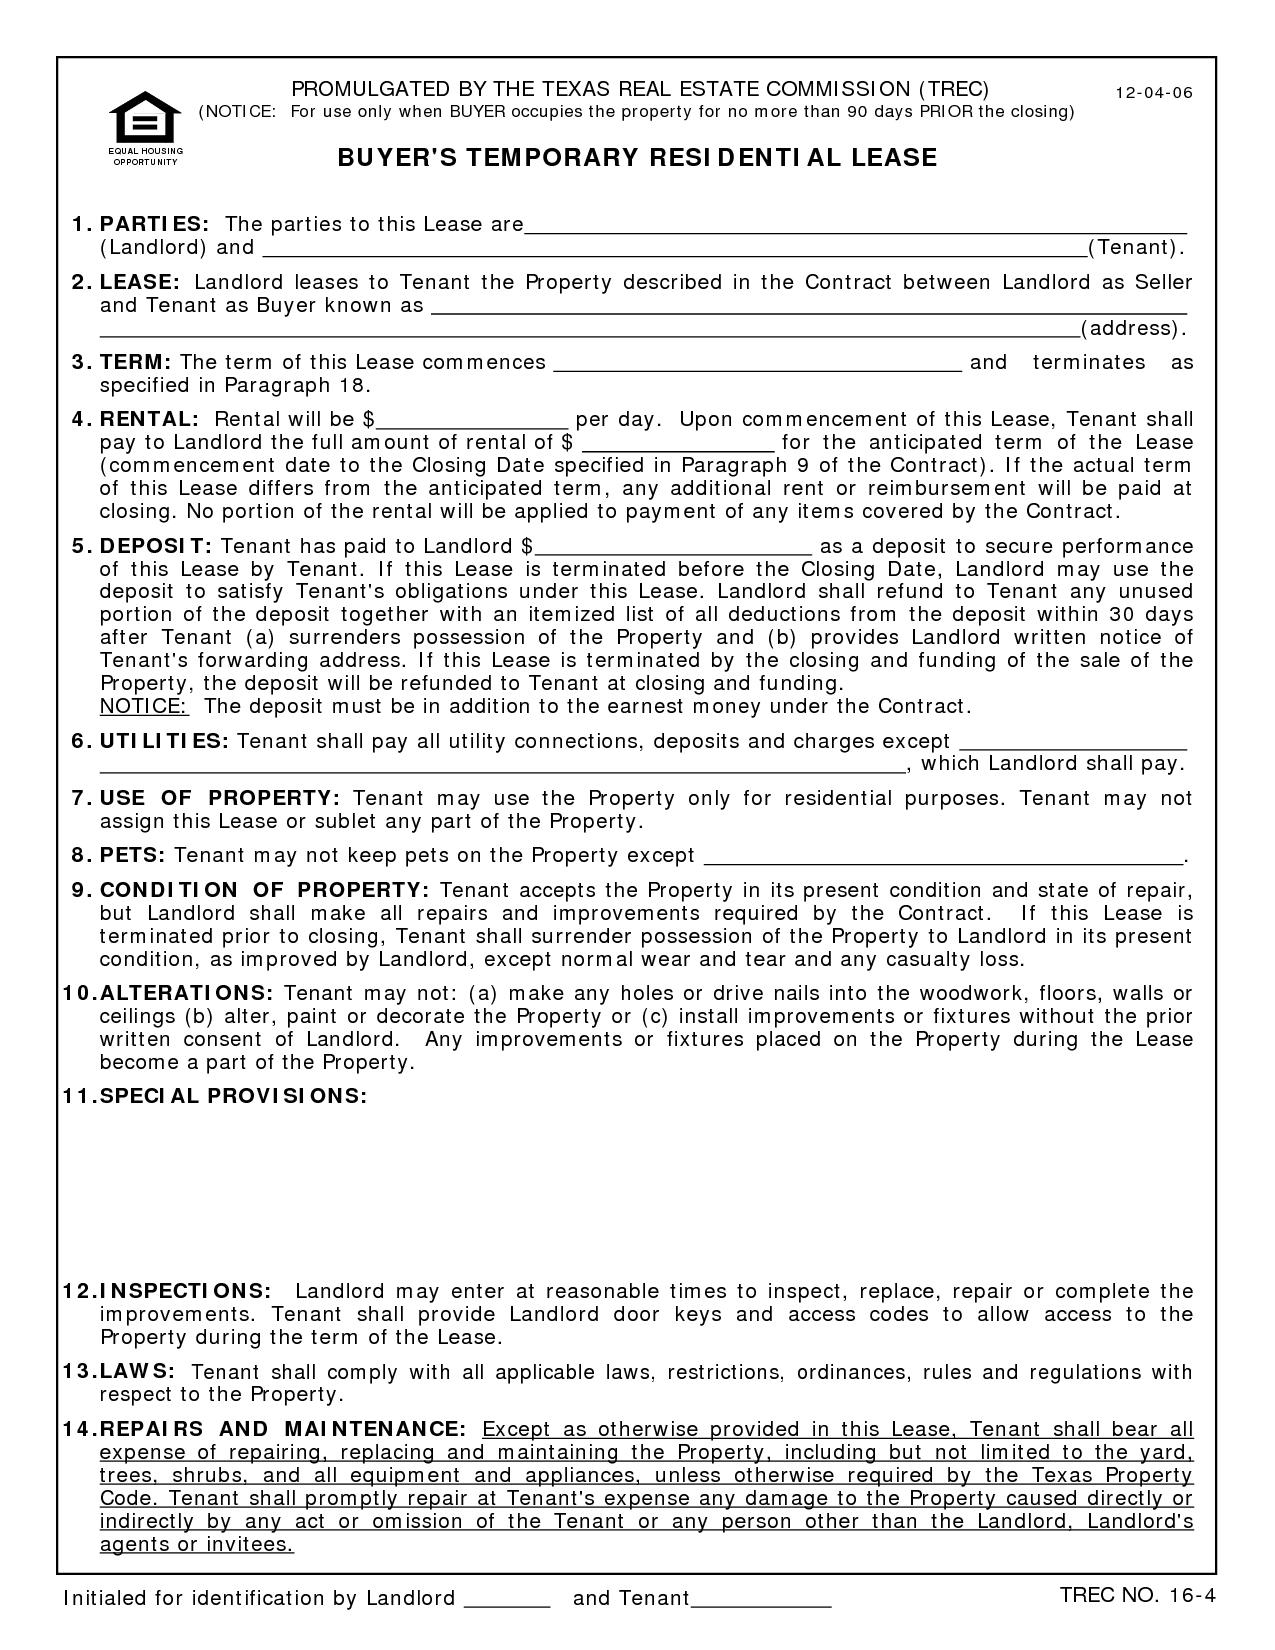 Print Free Printable Lease Agreement Texas - Id52092 Opendata - Free Printable Lease Agreement Texas